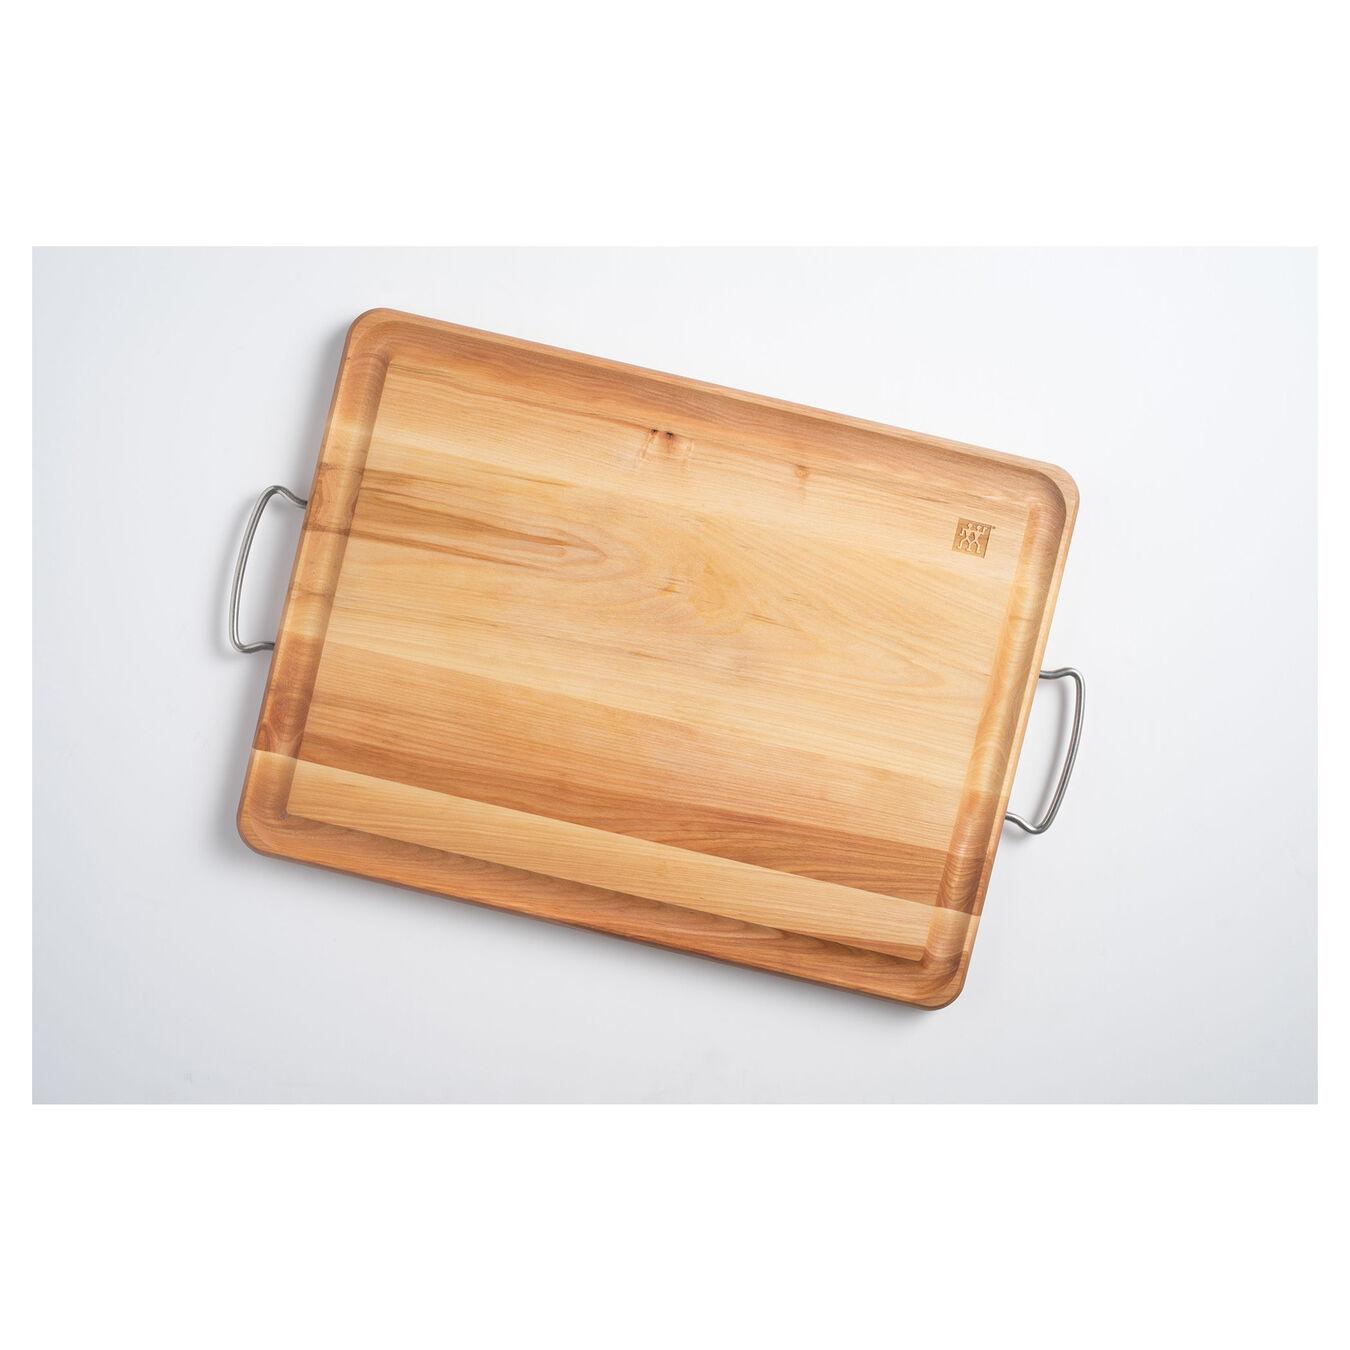 20x15x1-inch - Birchwood Carving Board w/Handles,,large 1